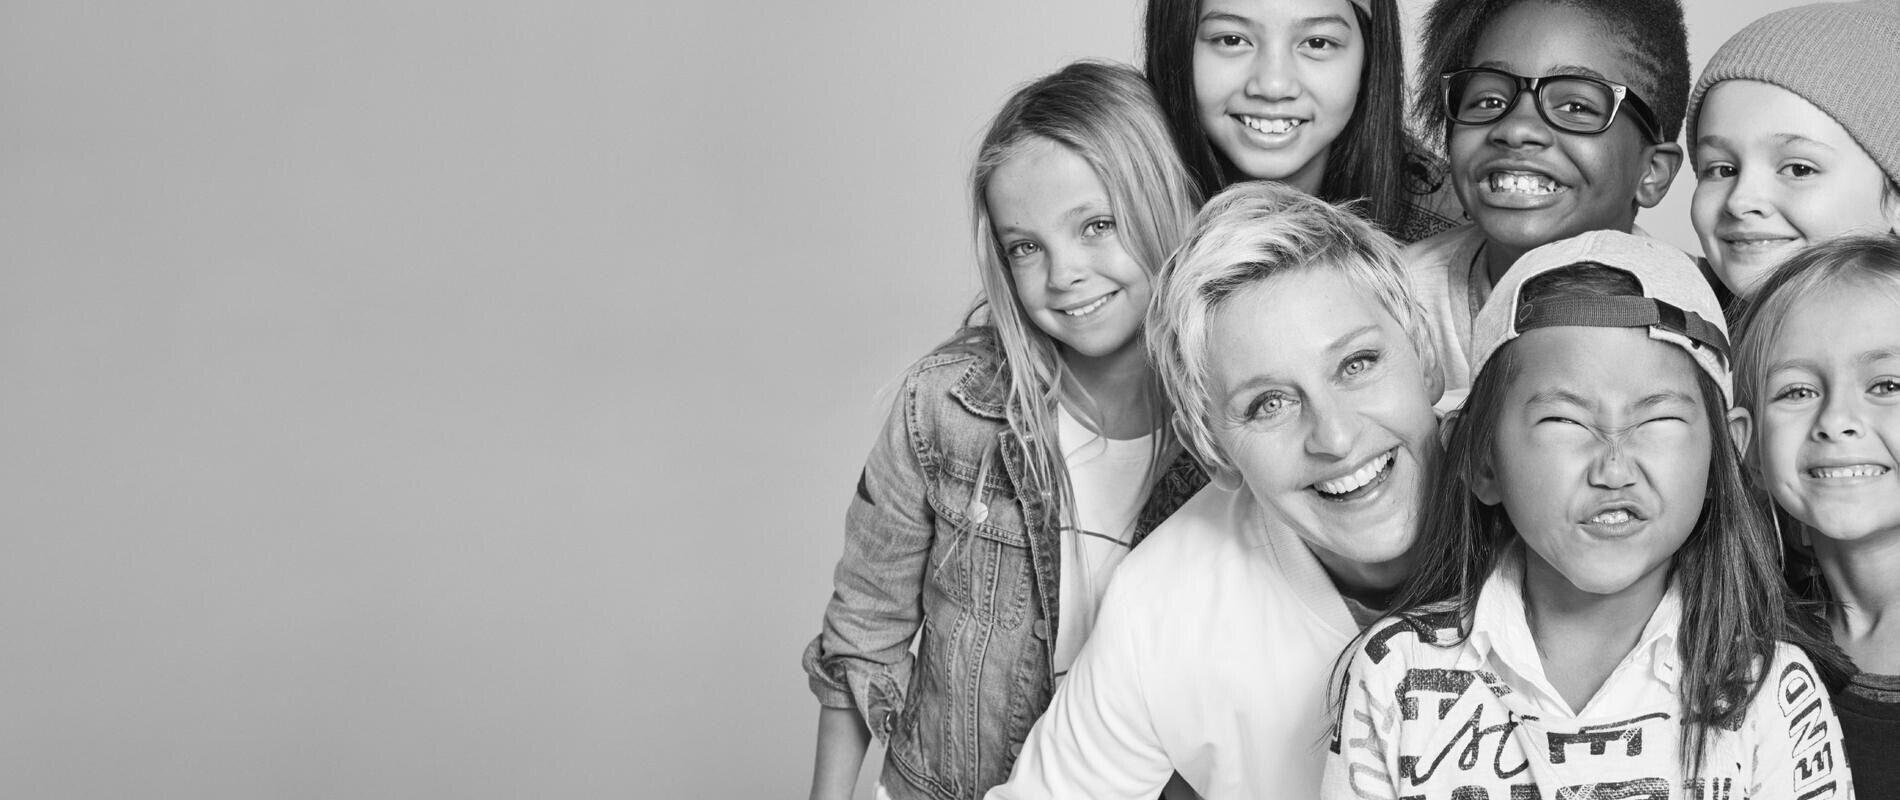 Gap搭CBS名嘴艾伦合作推出童装系列GapKidsxED